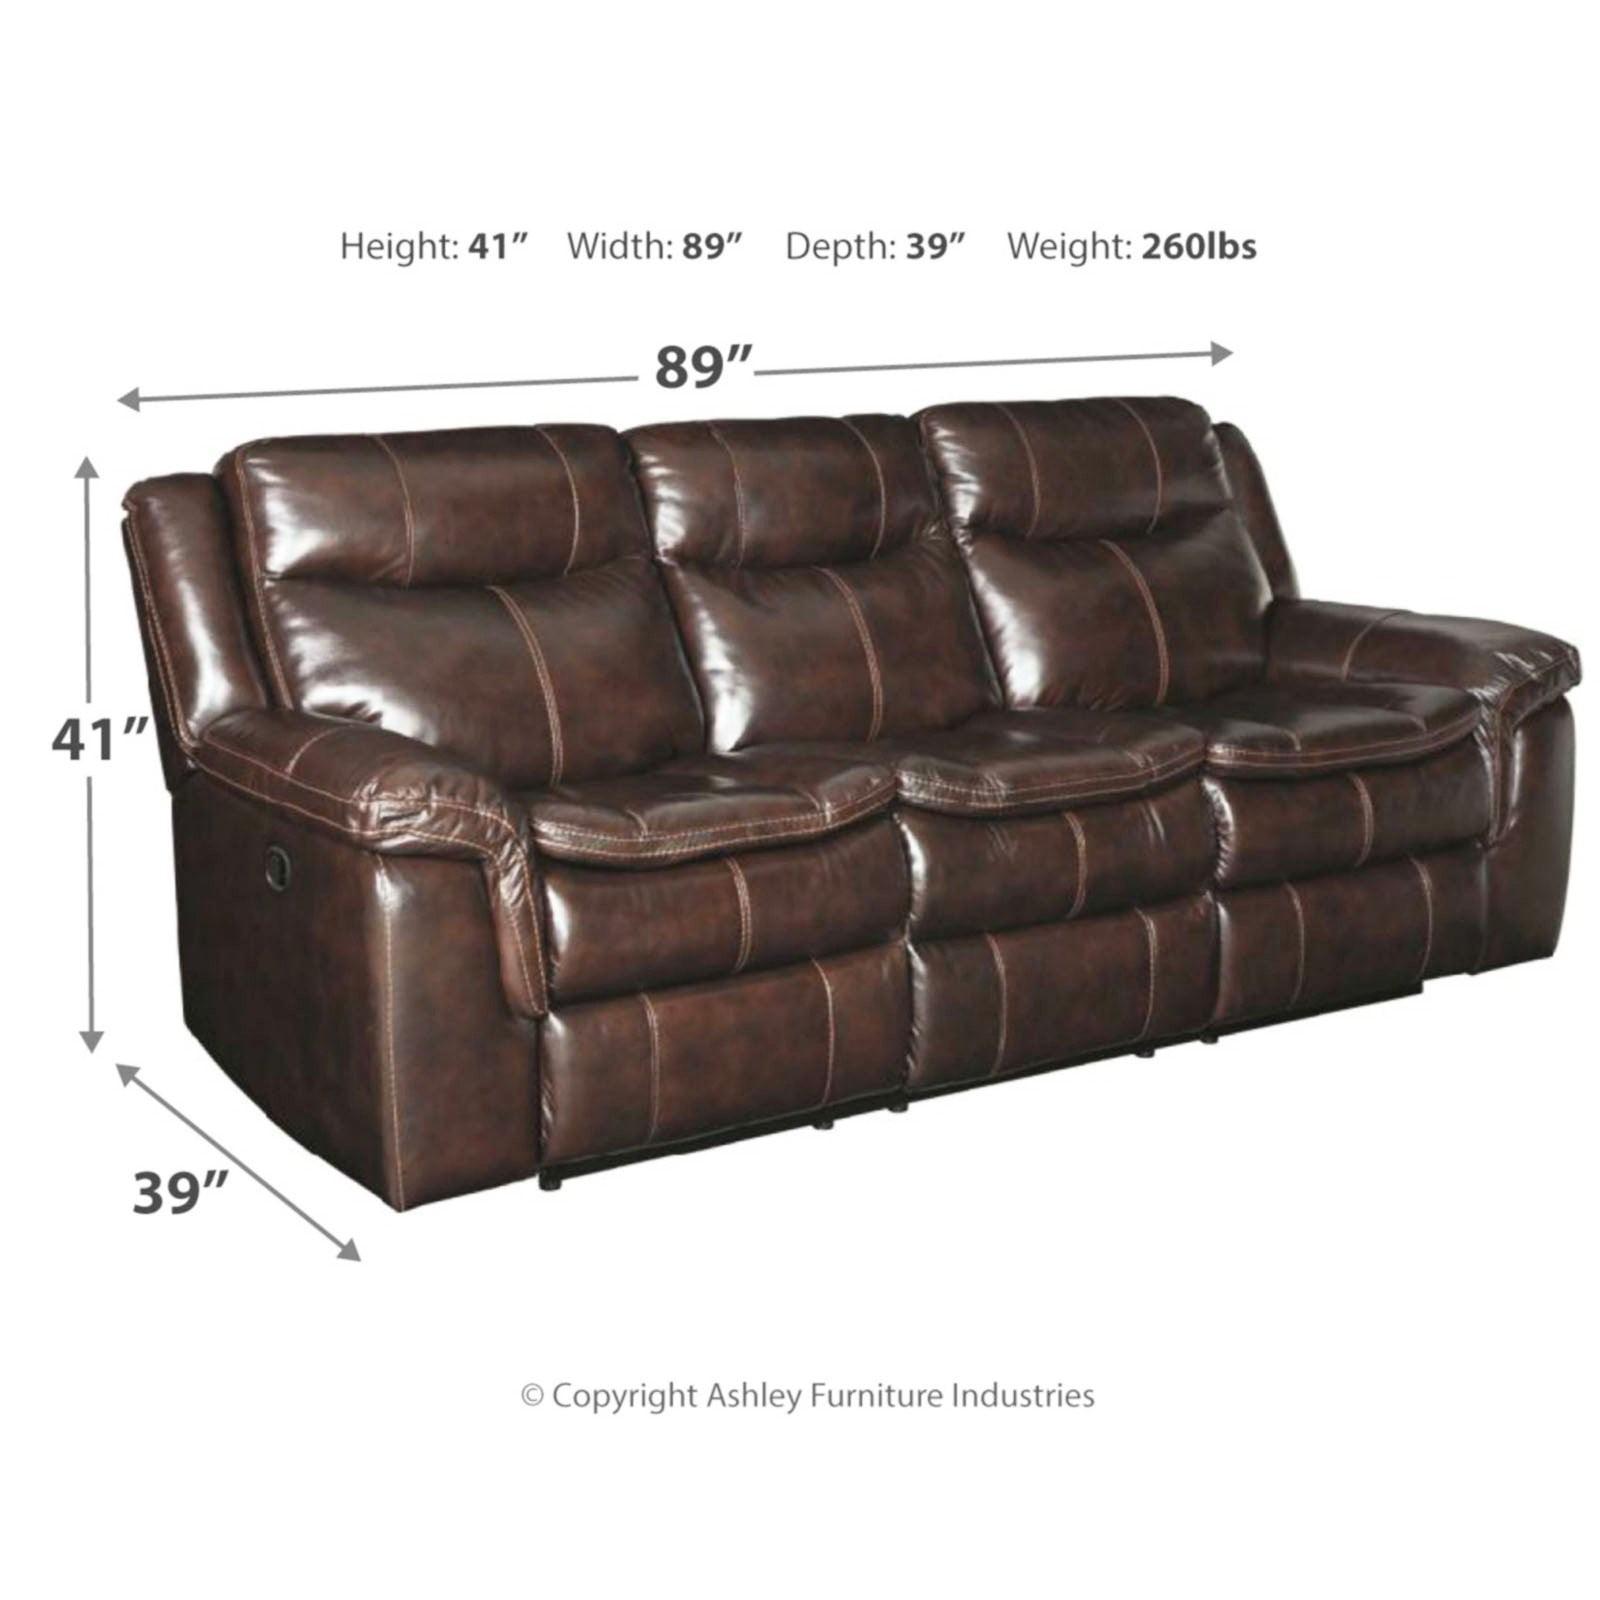 Ashley Furniture Lockesburg Leather Power Reclining Sofa In Canyon Walmart Com Walmart Com